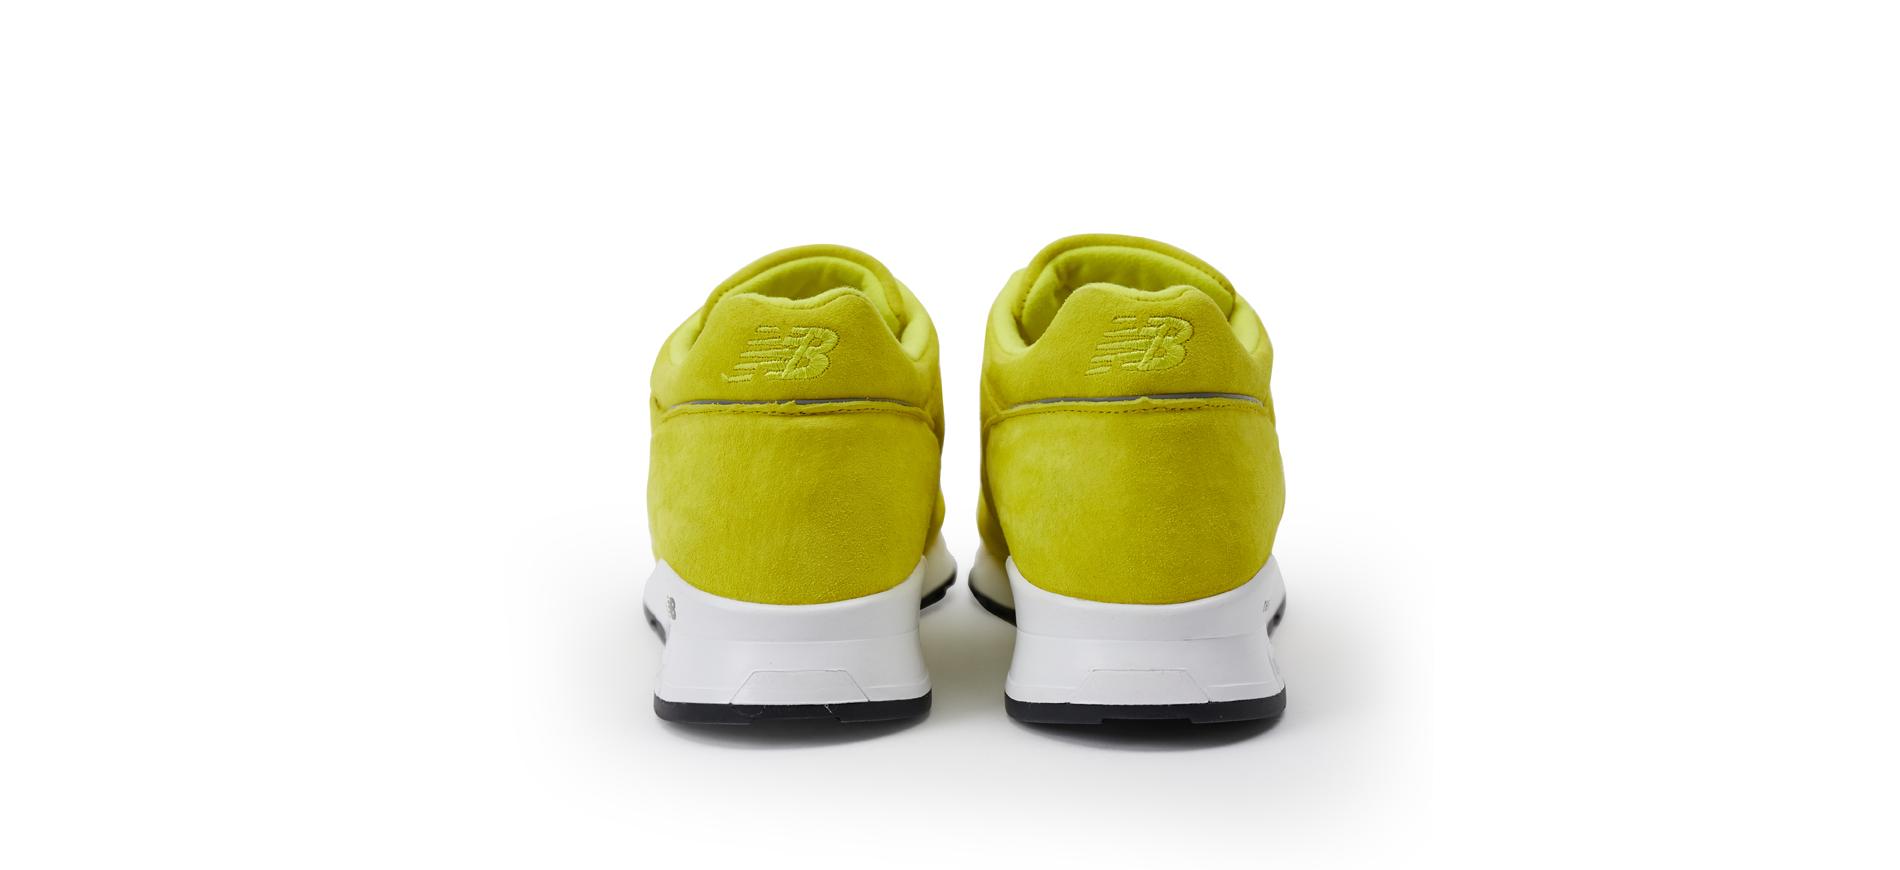 pop-trading-company-new-balance-1500-electric-yellow-2